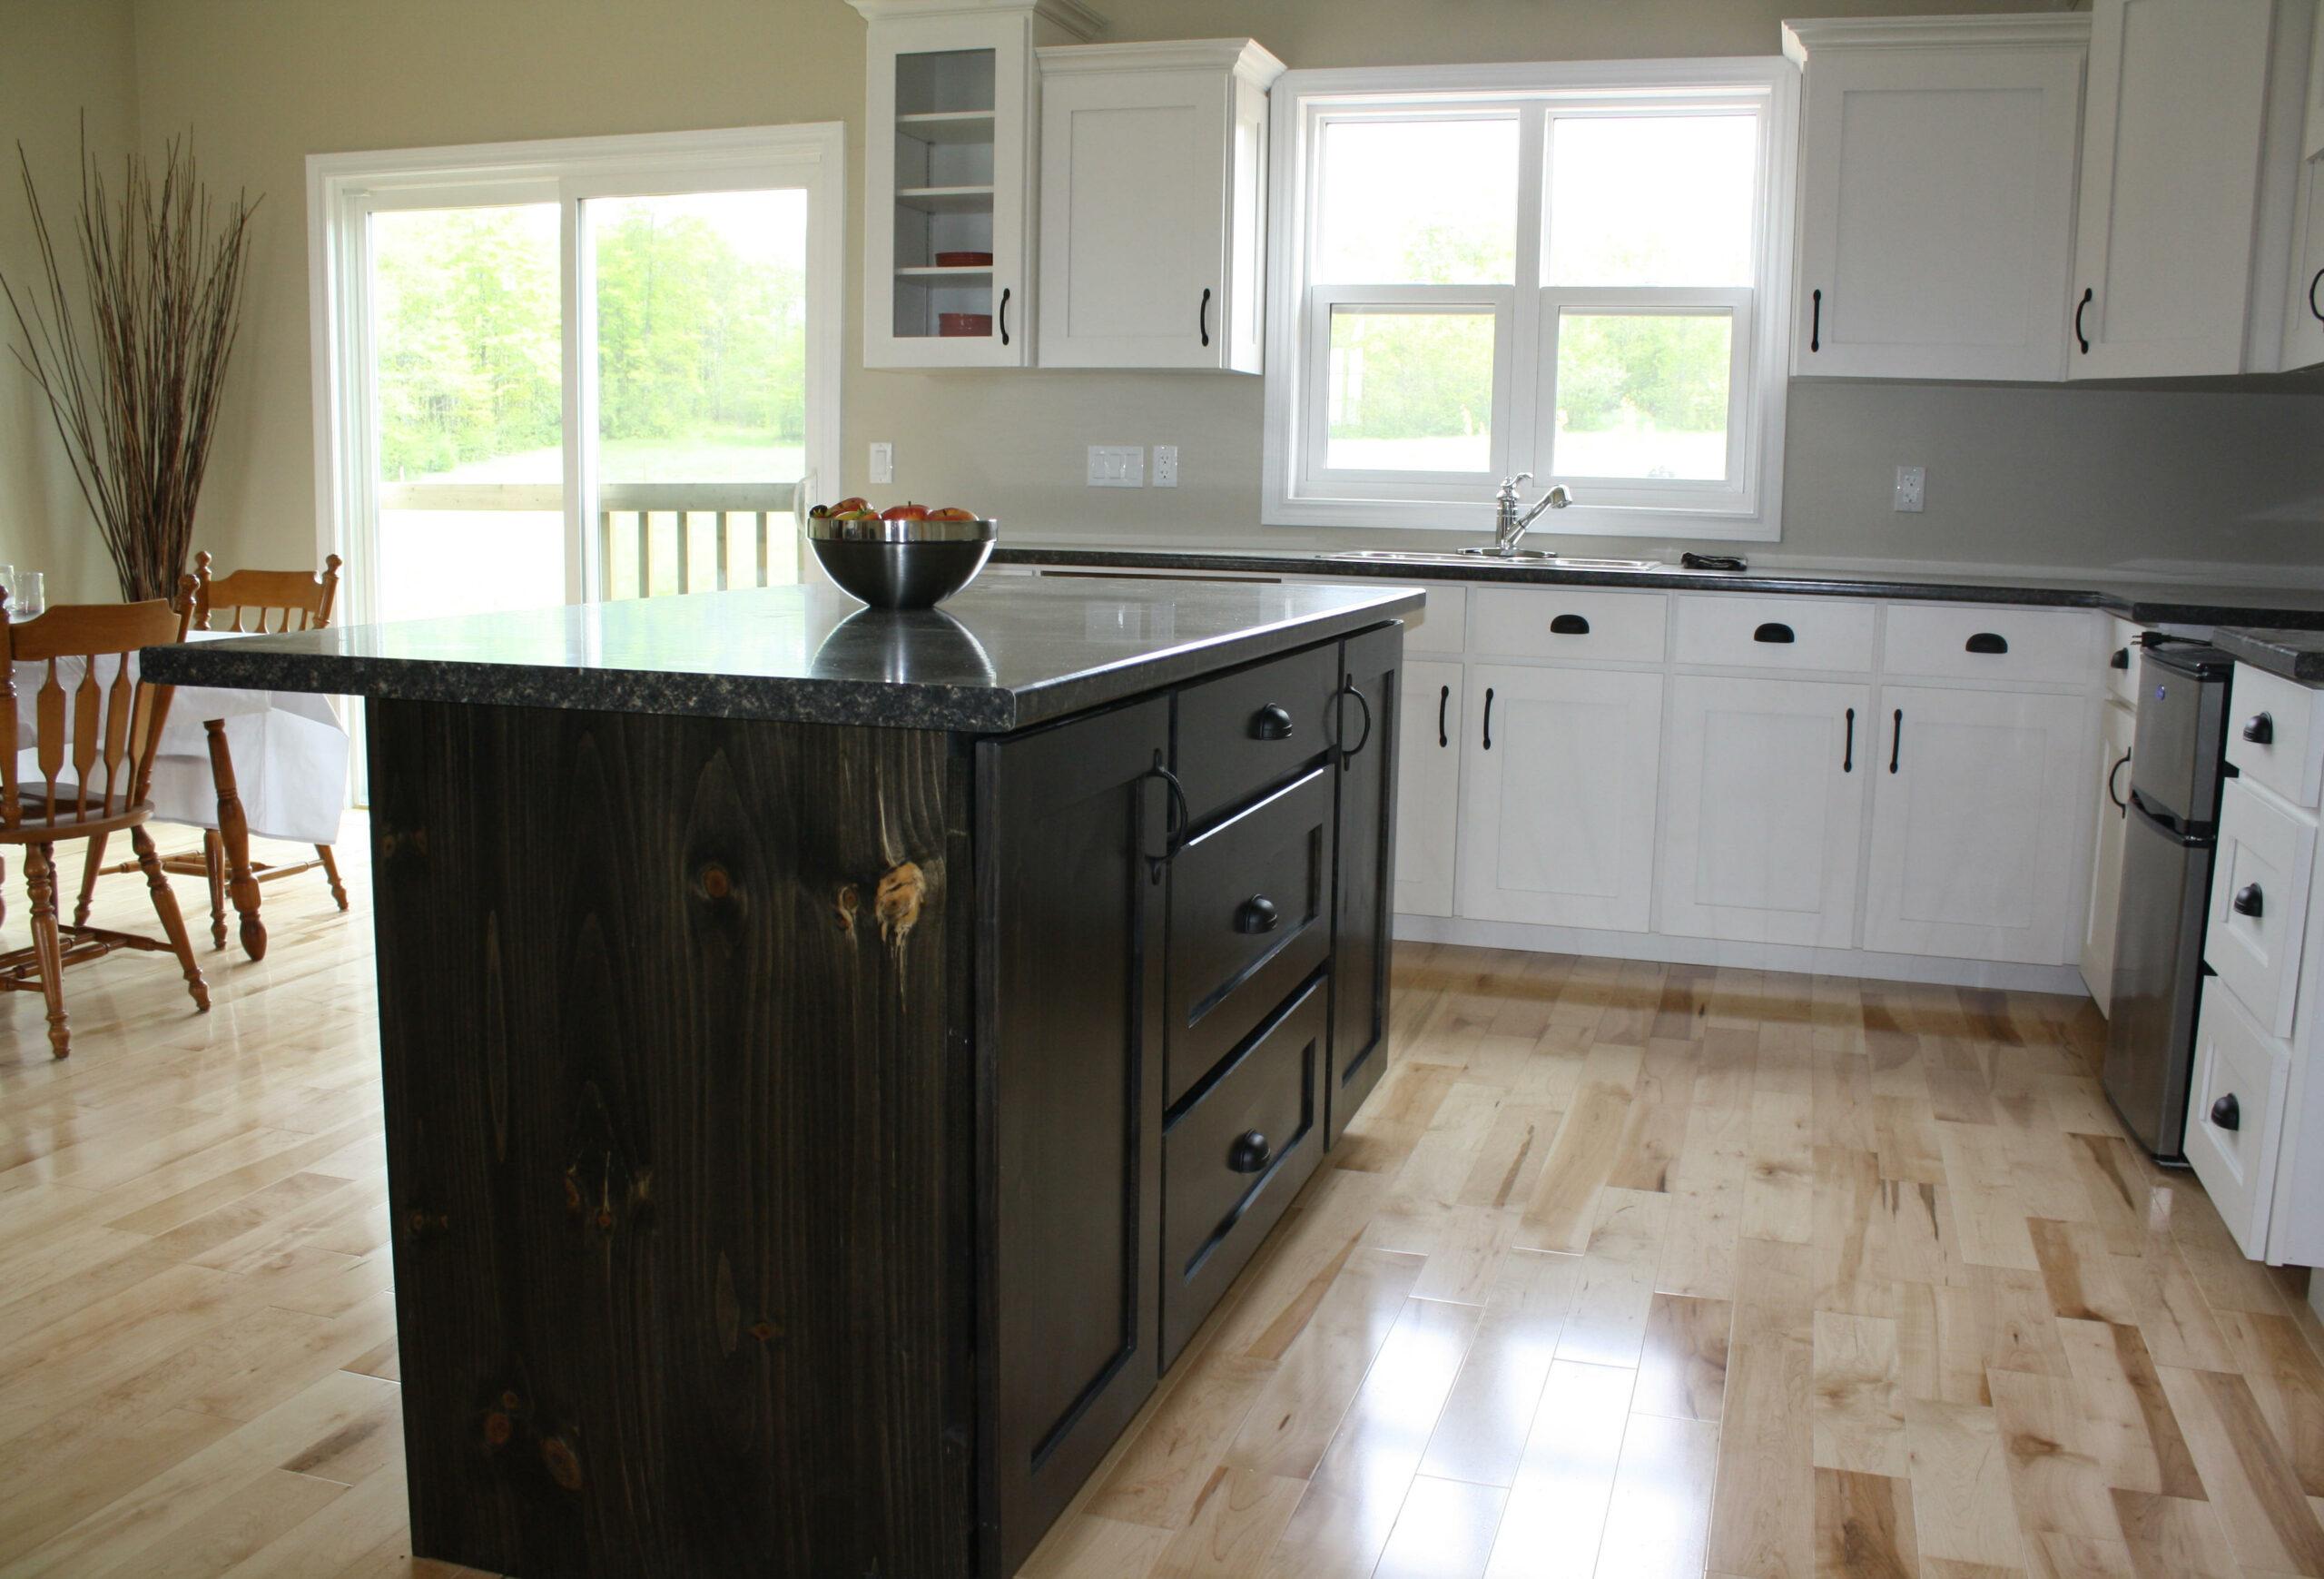 Dual tone kitchen cupboards